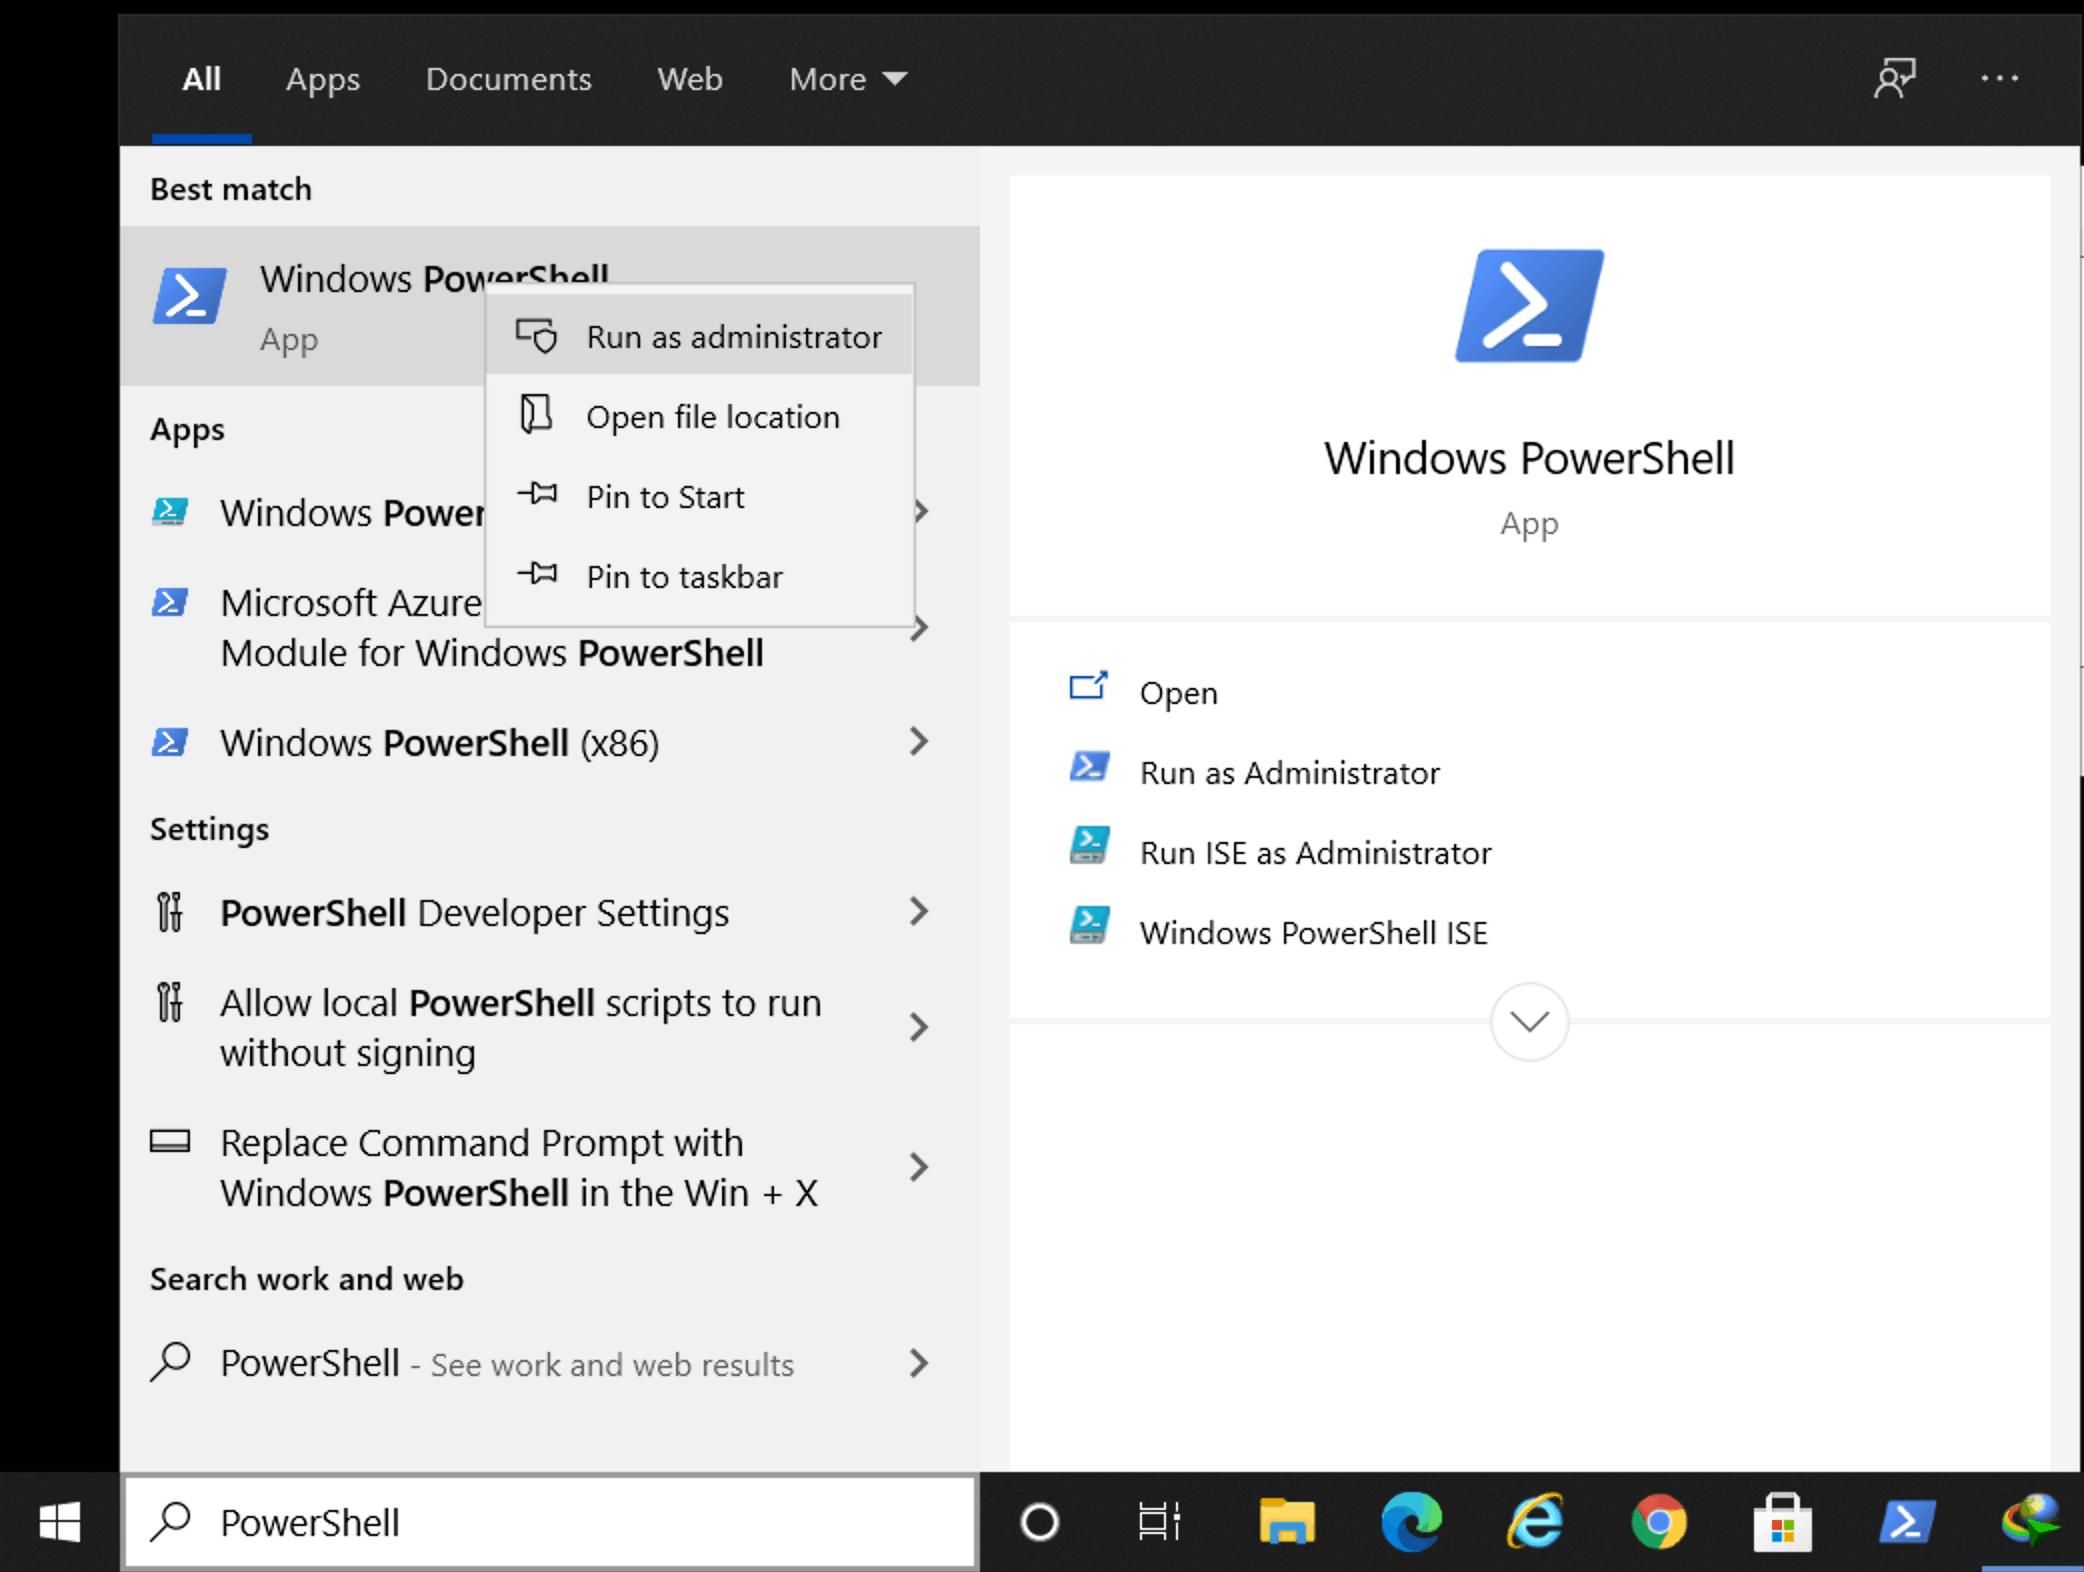 PowerShell in Windows